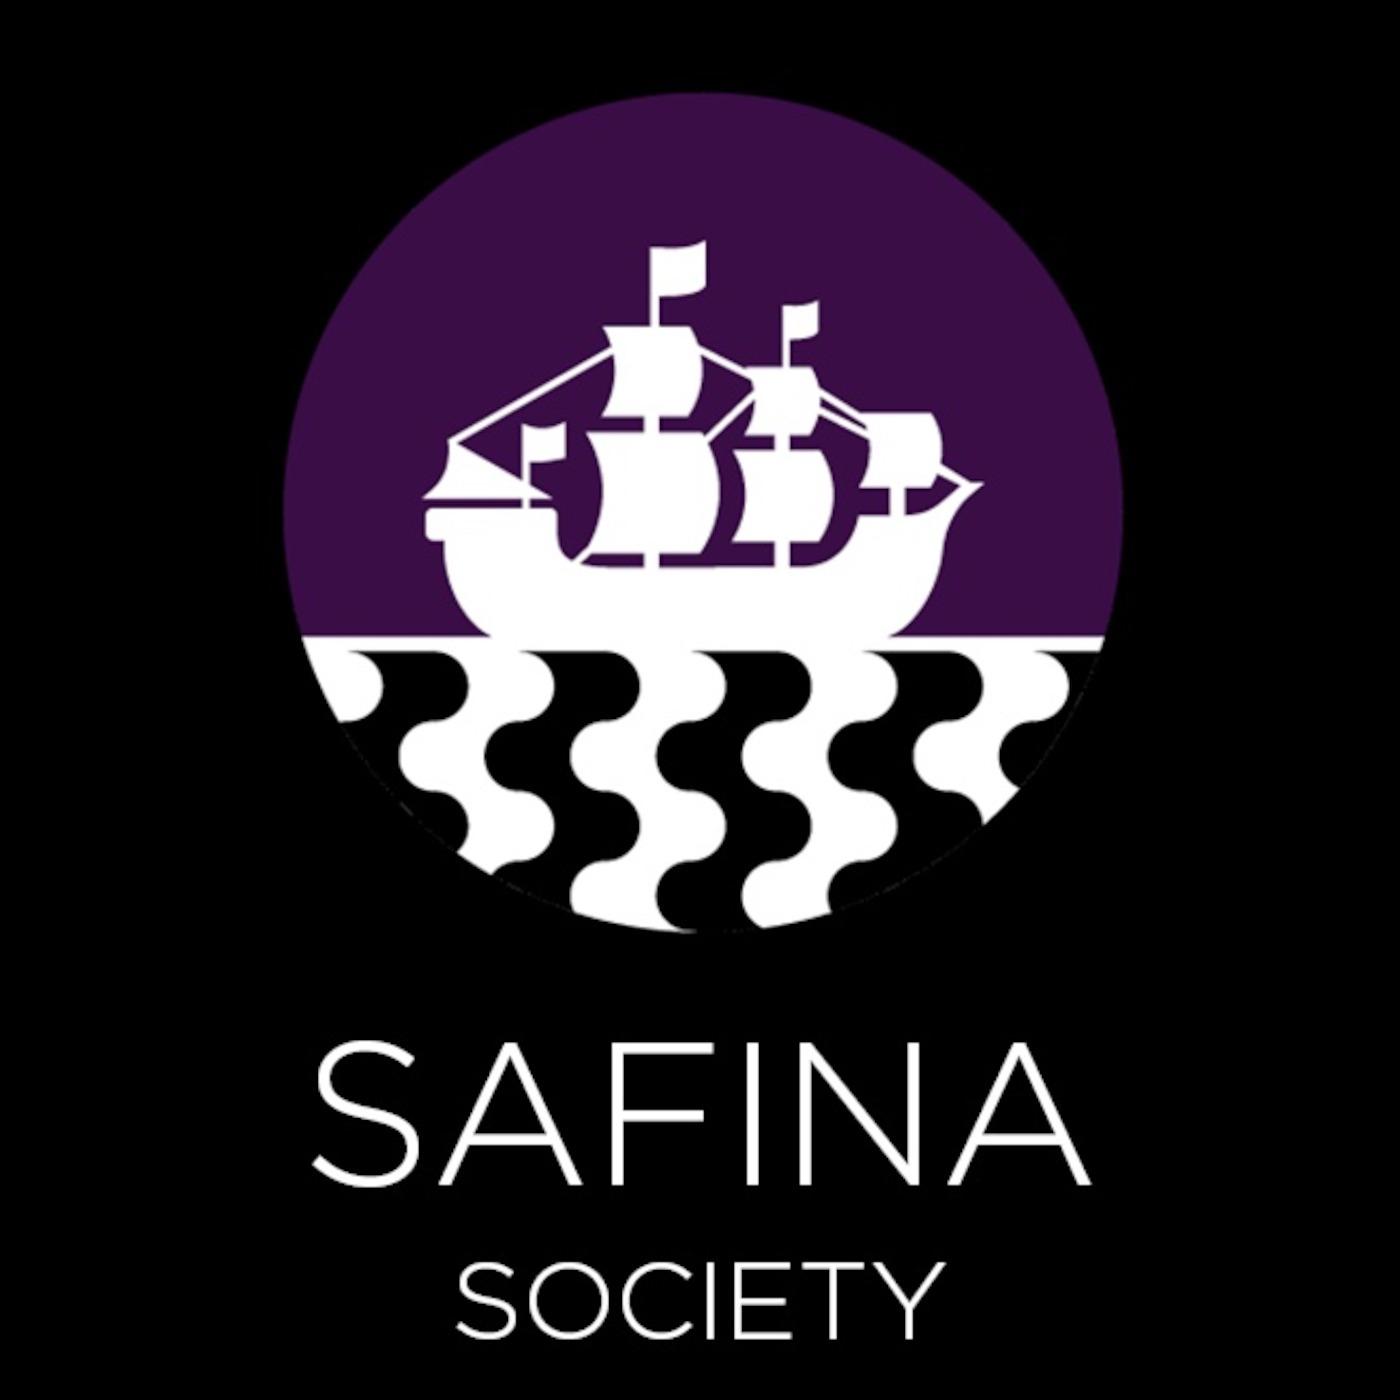 Safina Society